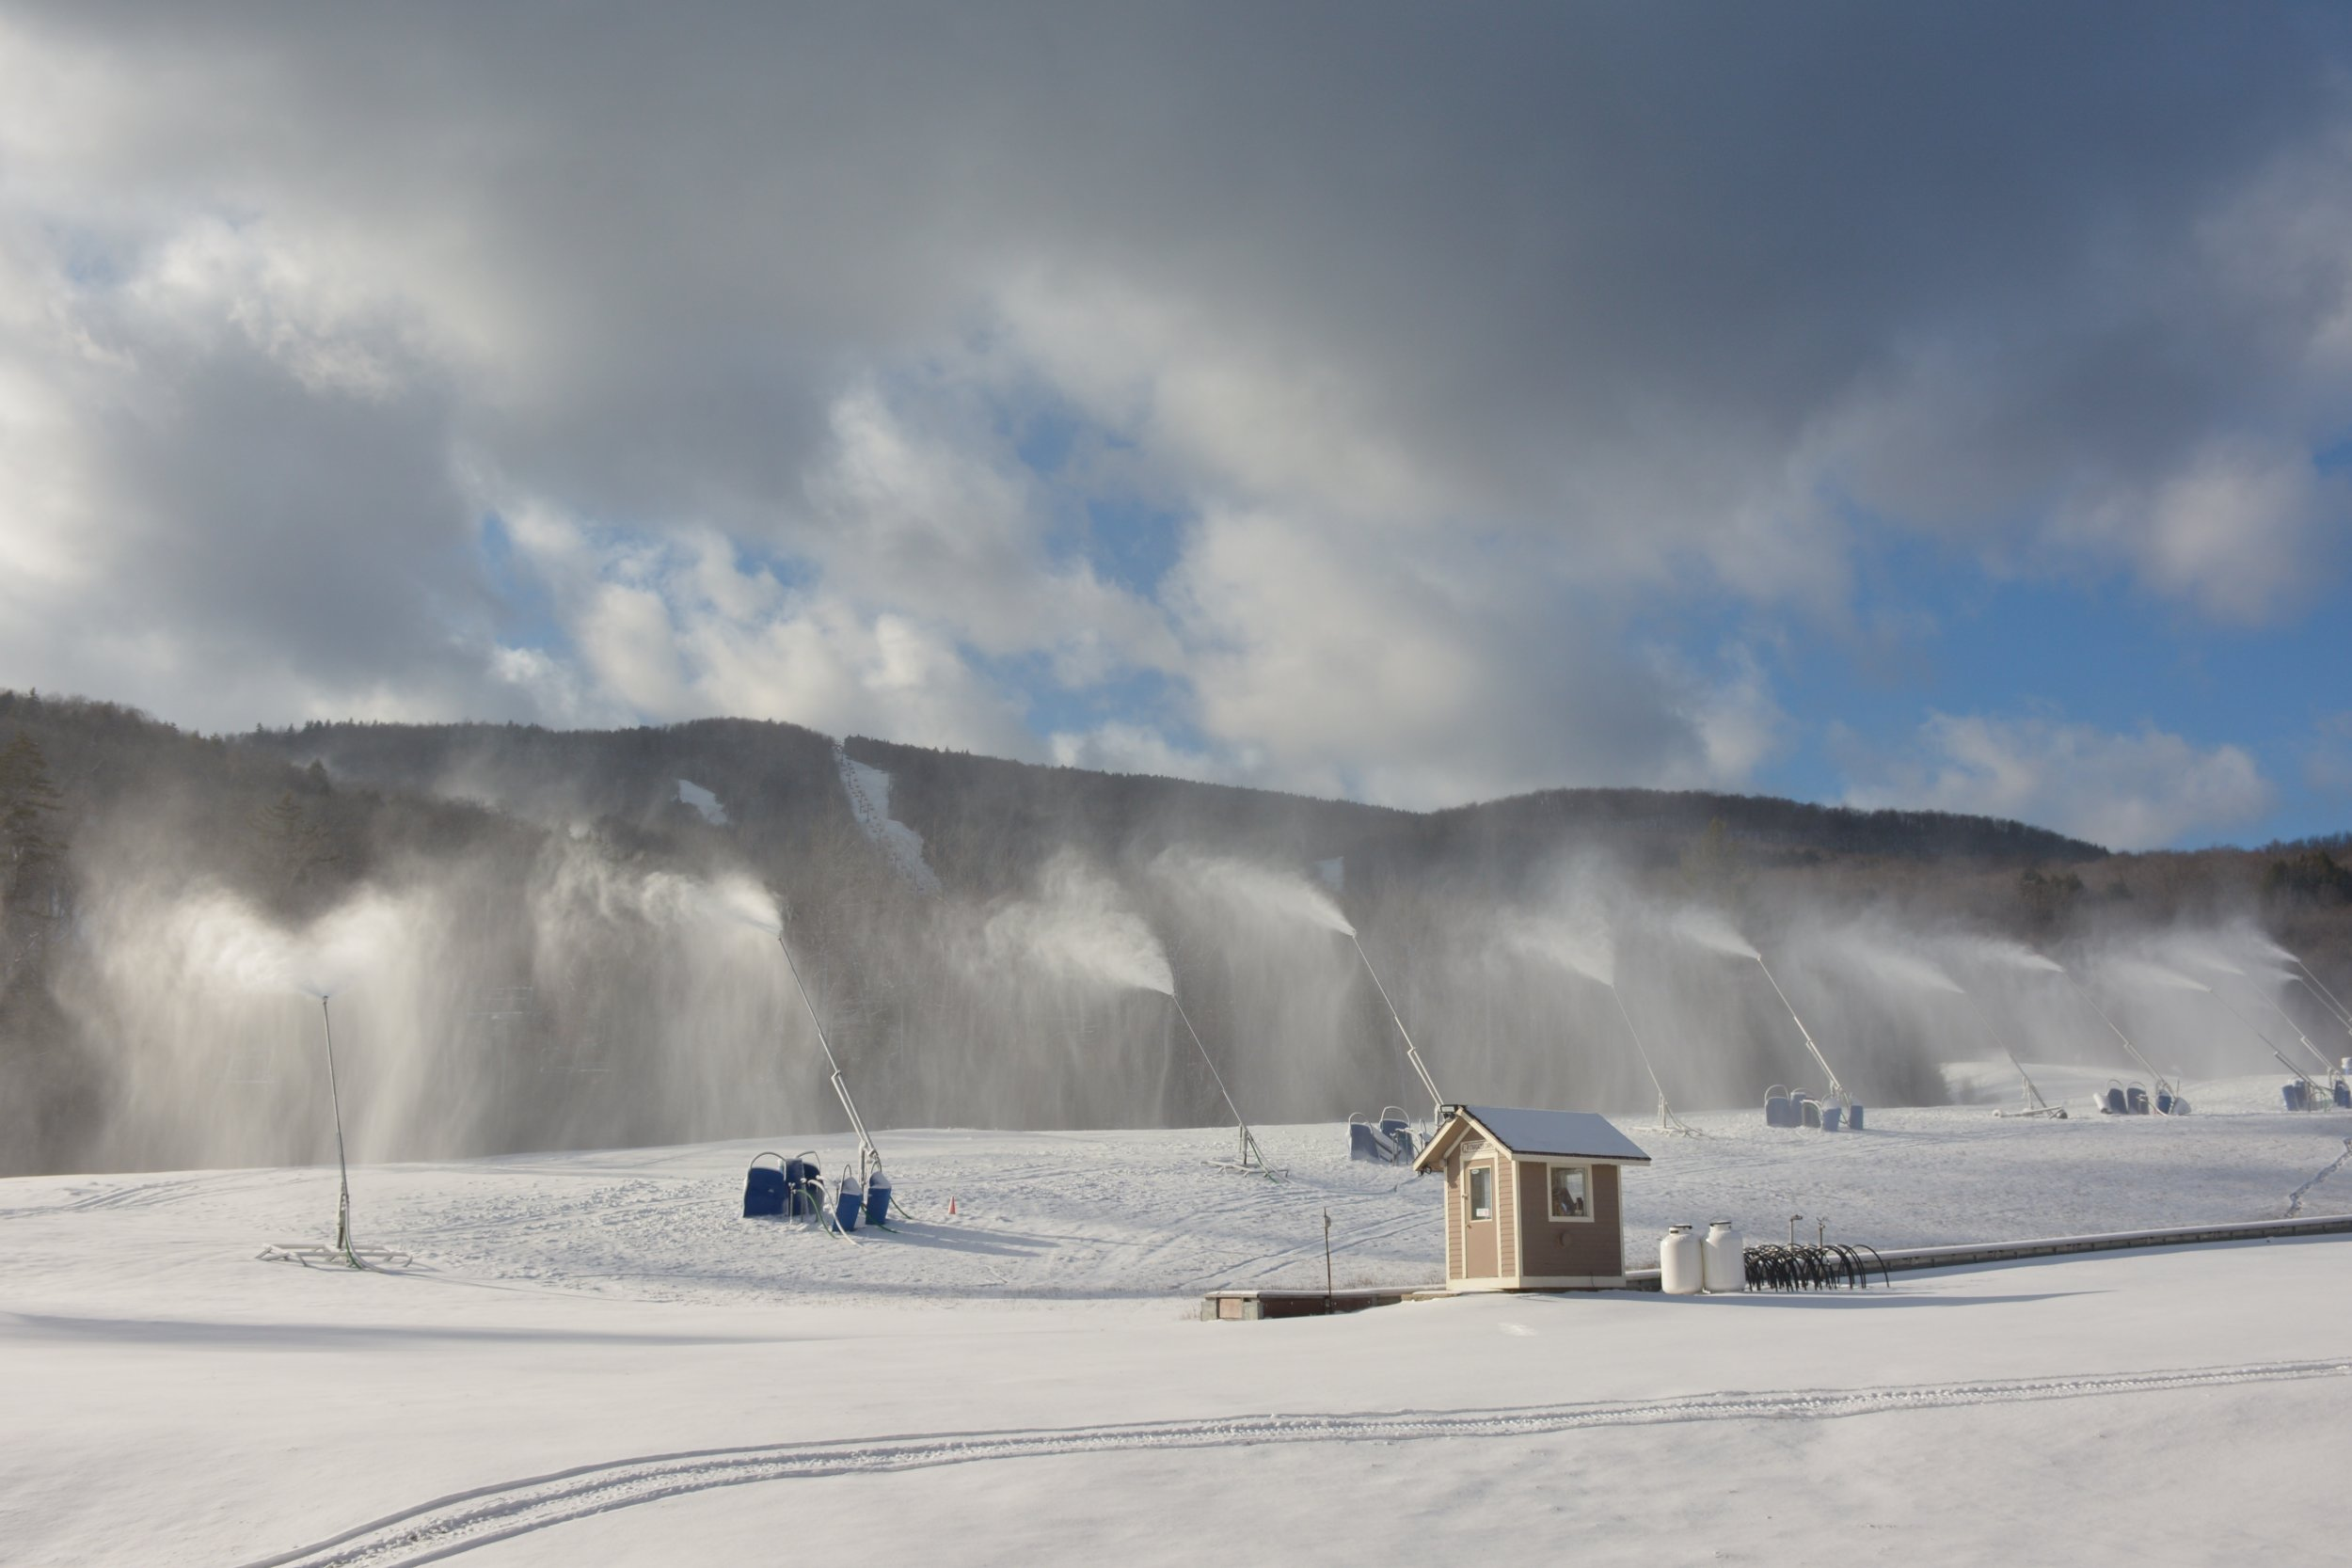 12_22_december_skiing